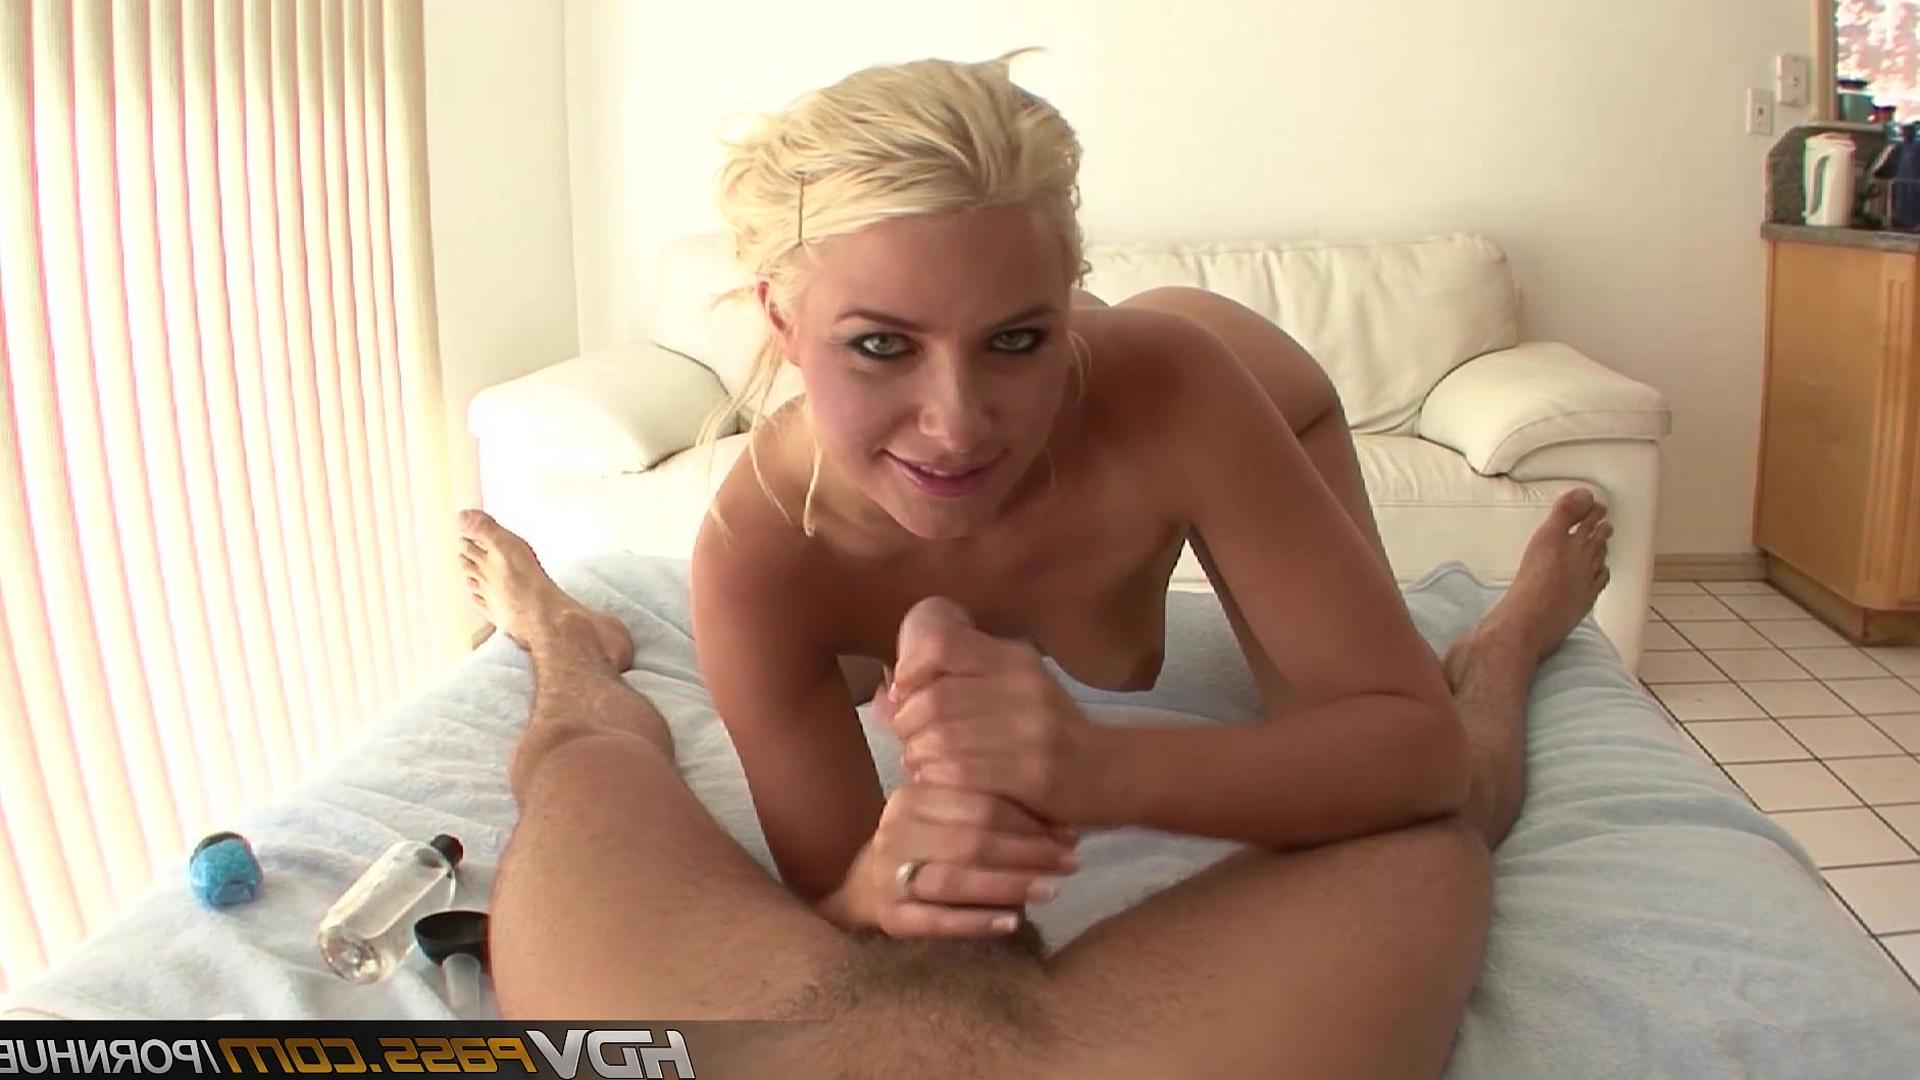 Порно видео дрочи онлайн